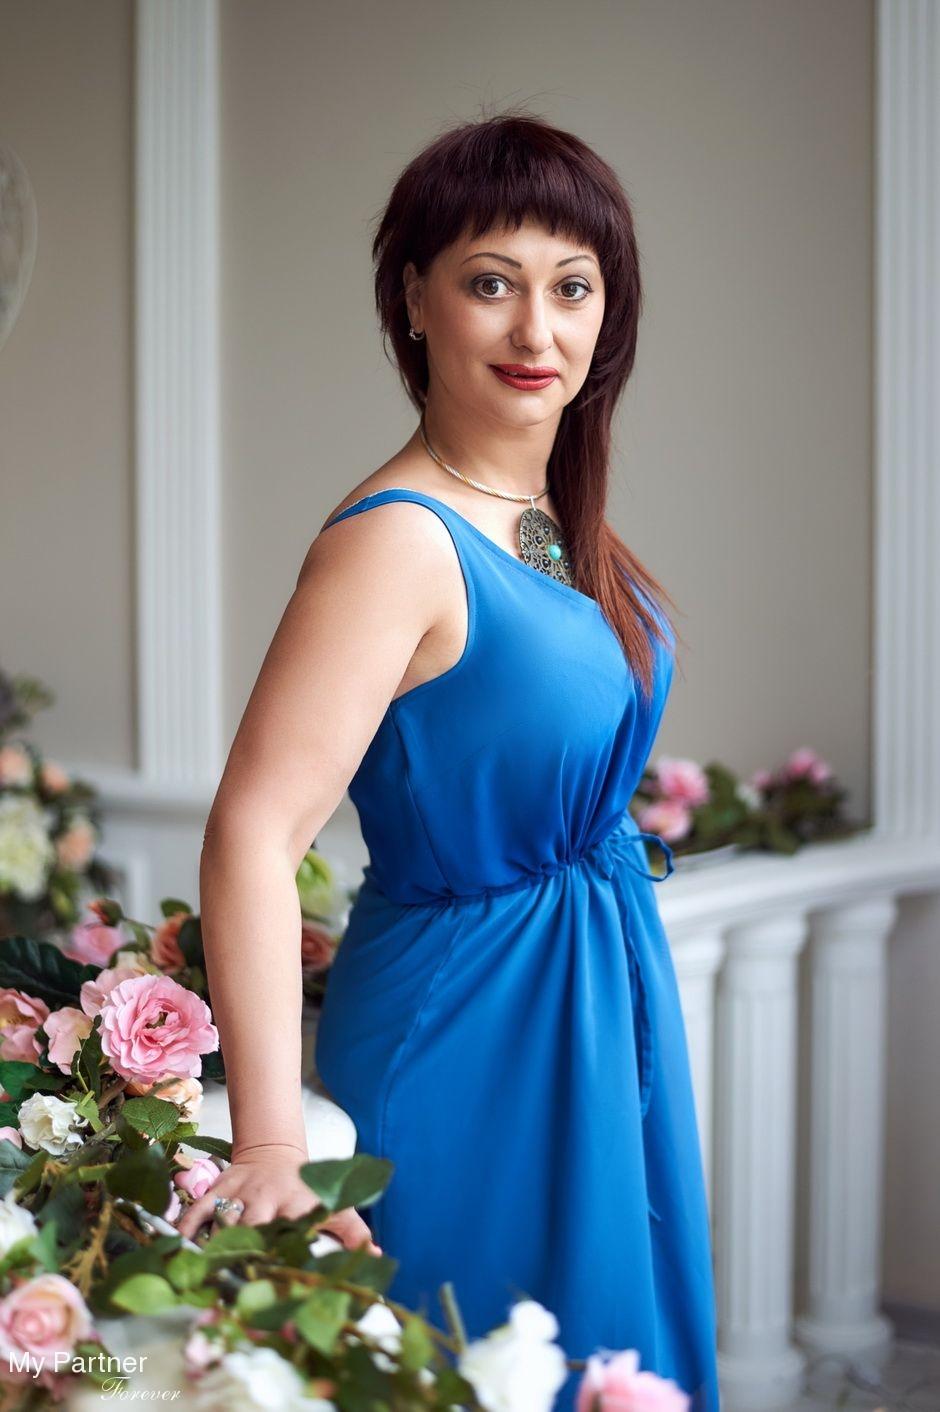 ukraine brides dating and marriage aleksa looking for ukraine brides ...